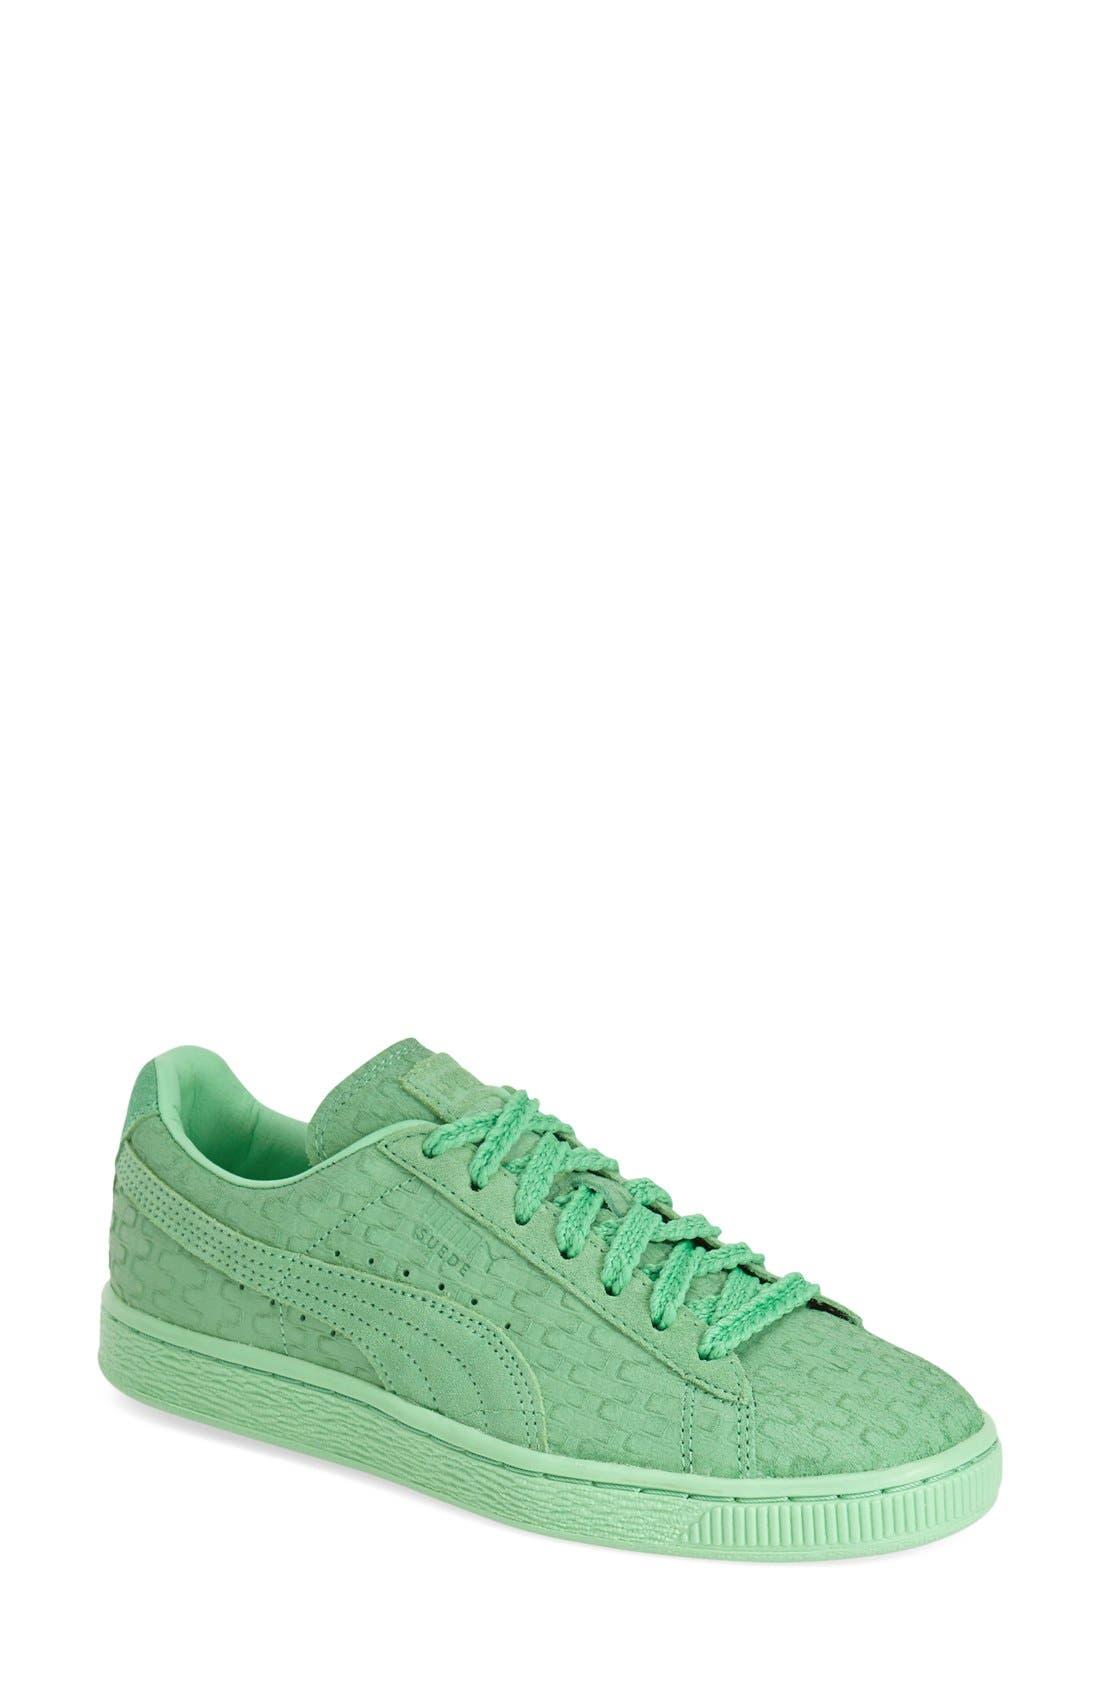 'Suede Classic - Solange' Sneaker,                             Main thumbnail 1, color,                             300